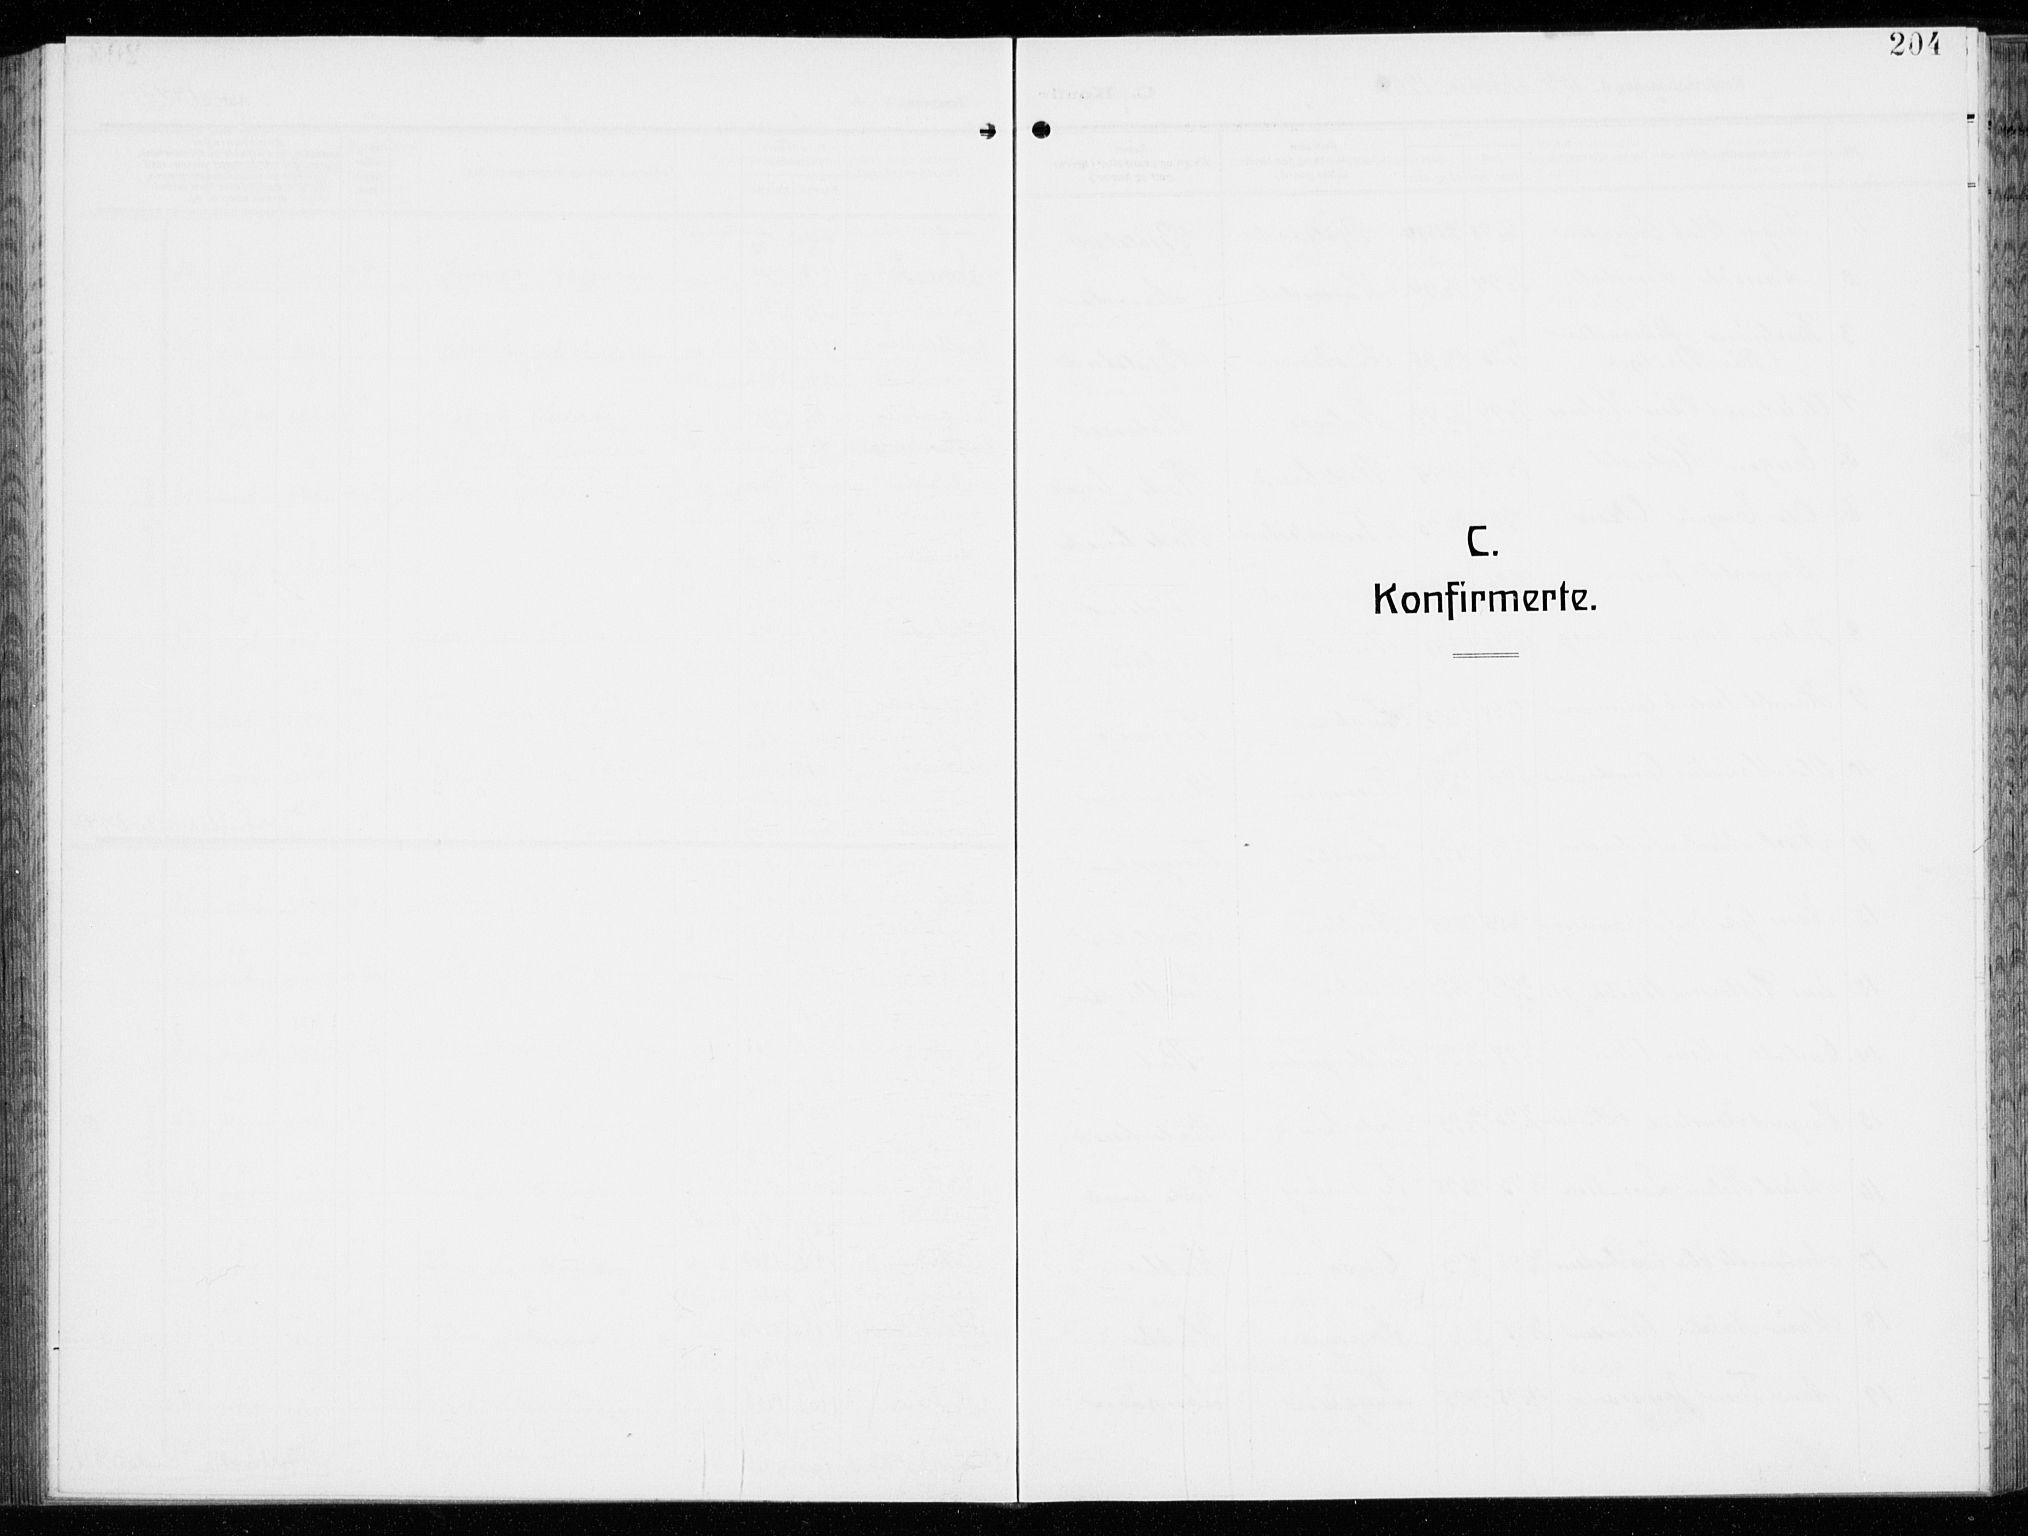 SAO, Kråkerøy prestekontor Kirkebøker, G/Ga/L0001: Klokkerbok nr. 1, 1908-1944, s. 204